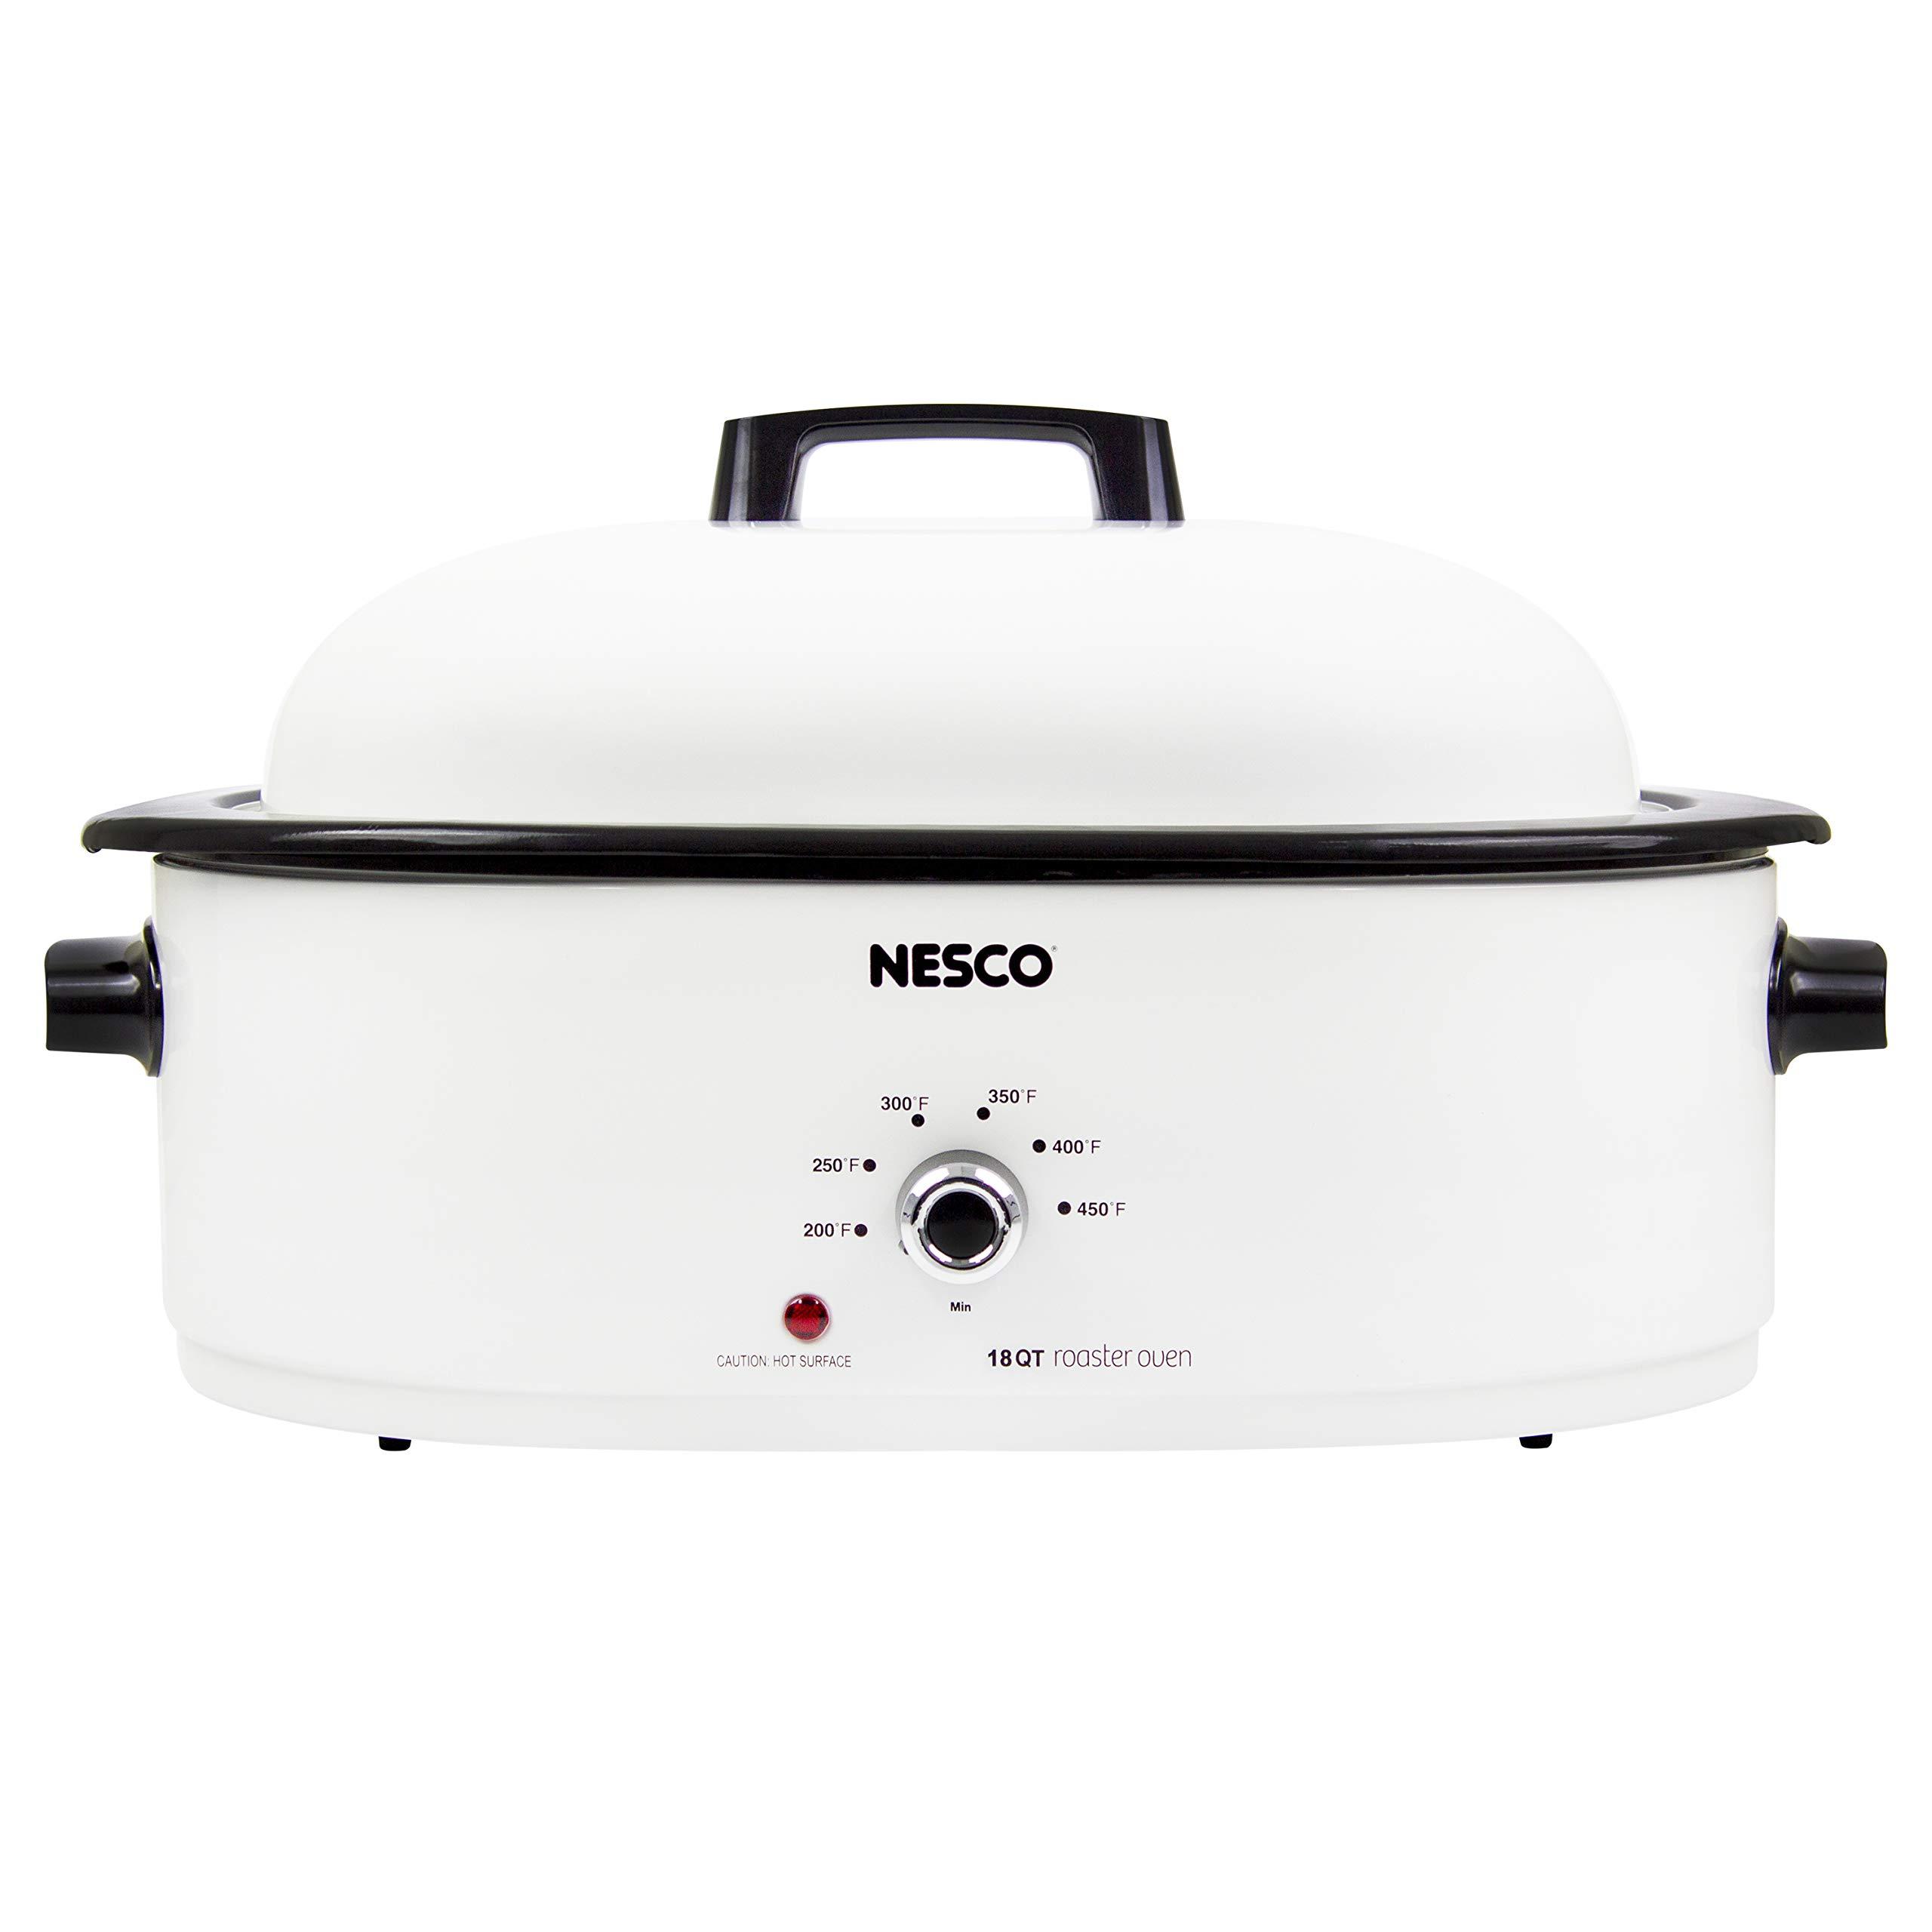 NESCO MWR18-14 Roaster Oven 18 Quarts, White by NESCO